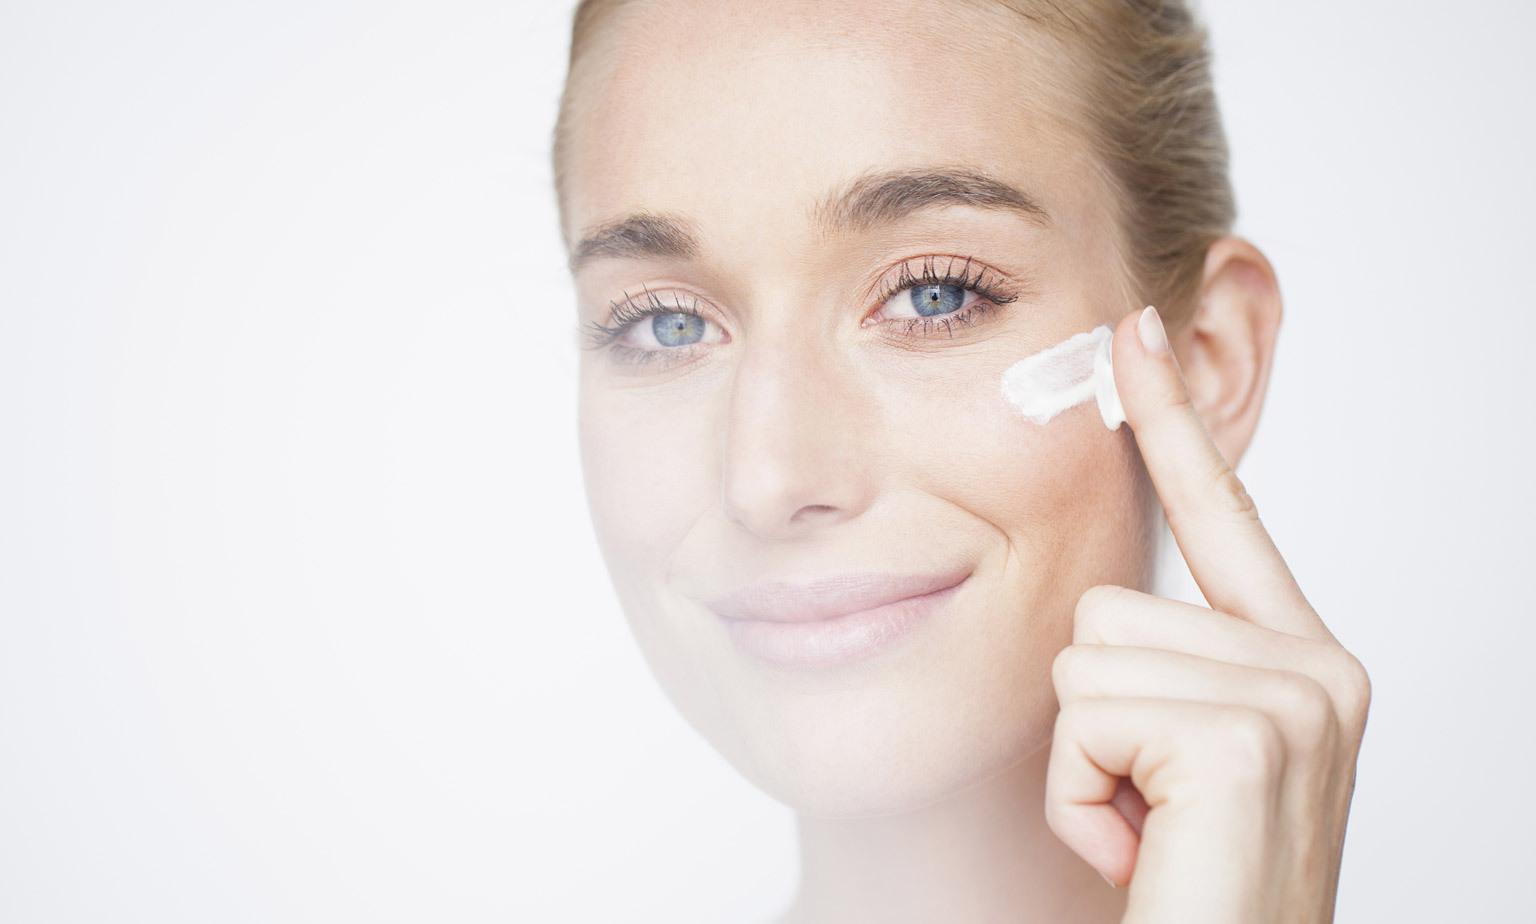 The Best in Skin Care